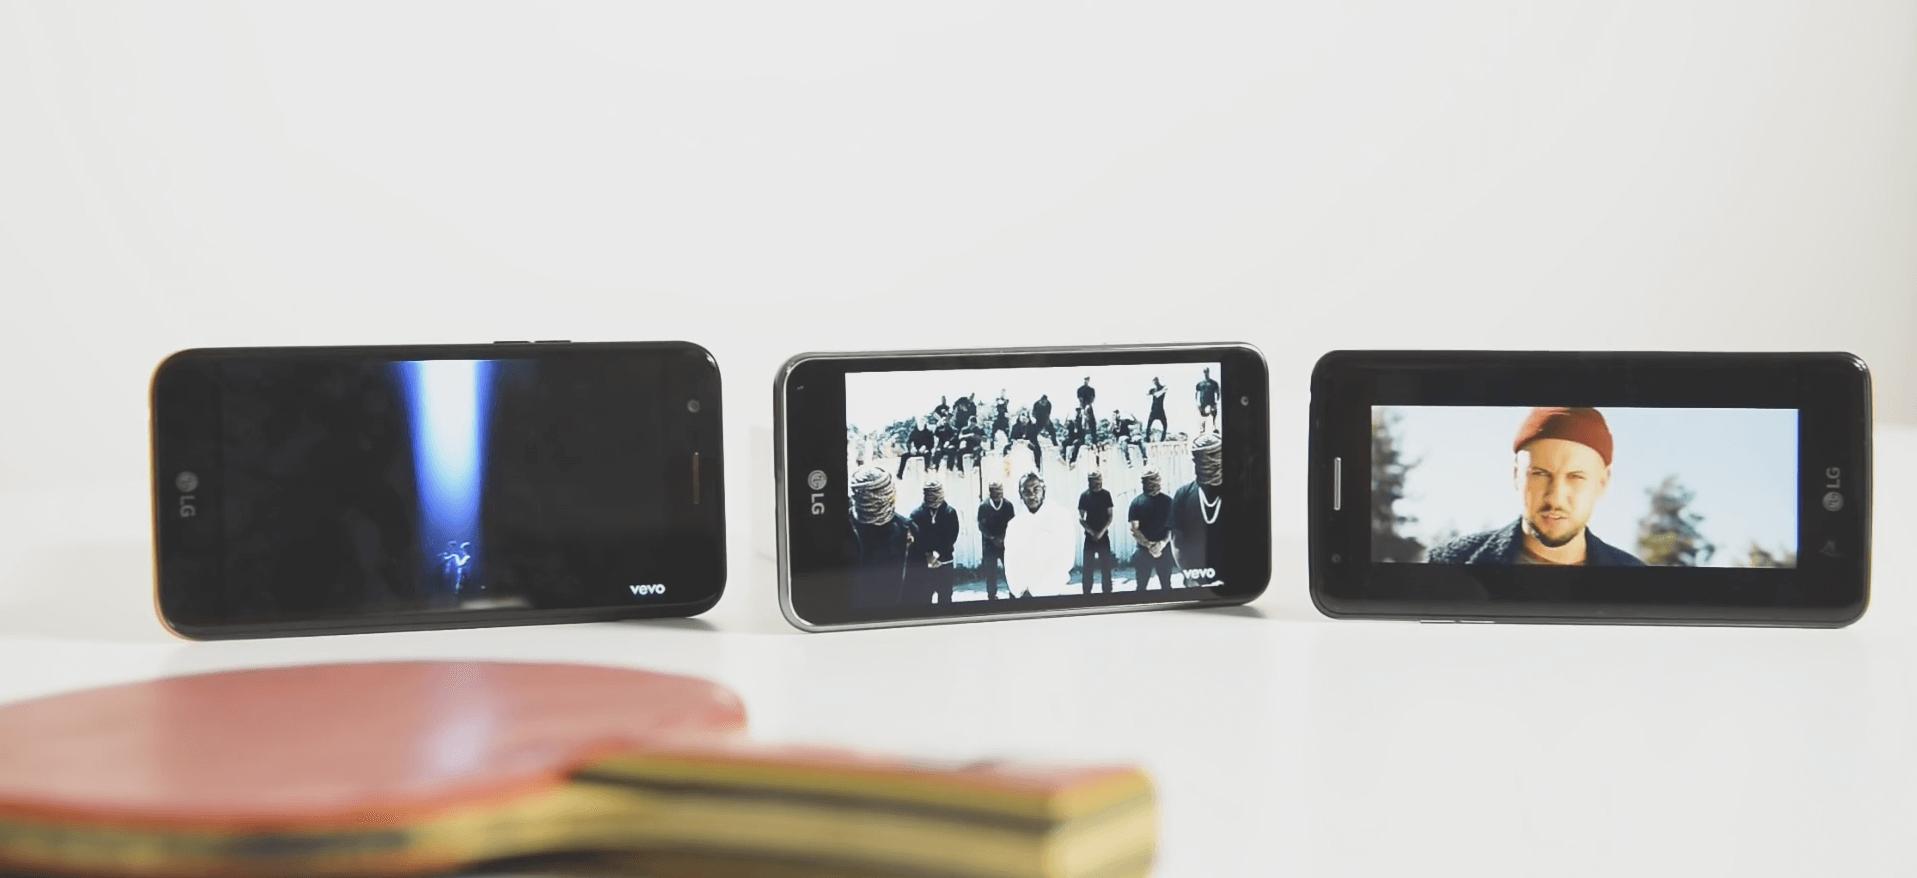 Смартфон lg m250 k10 lte 2017